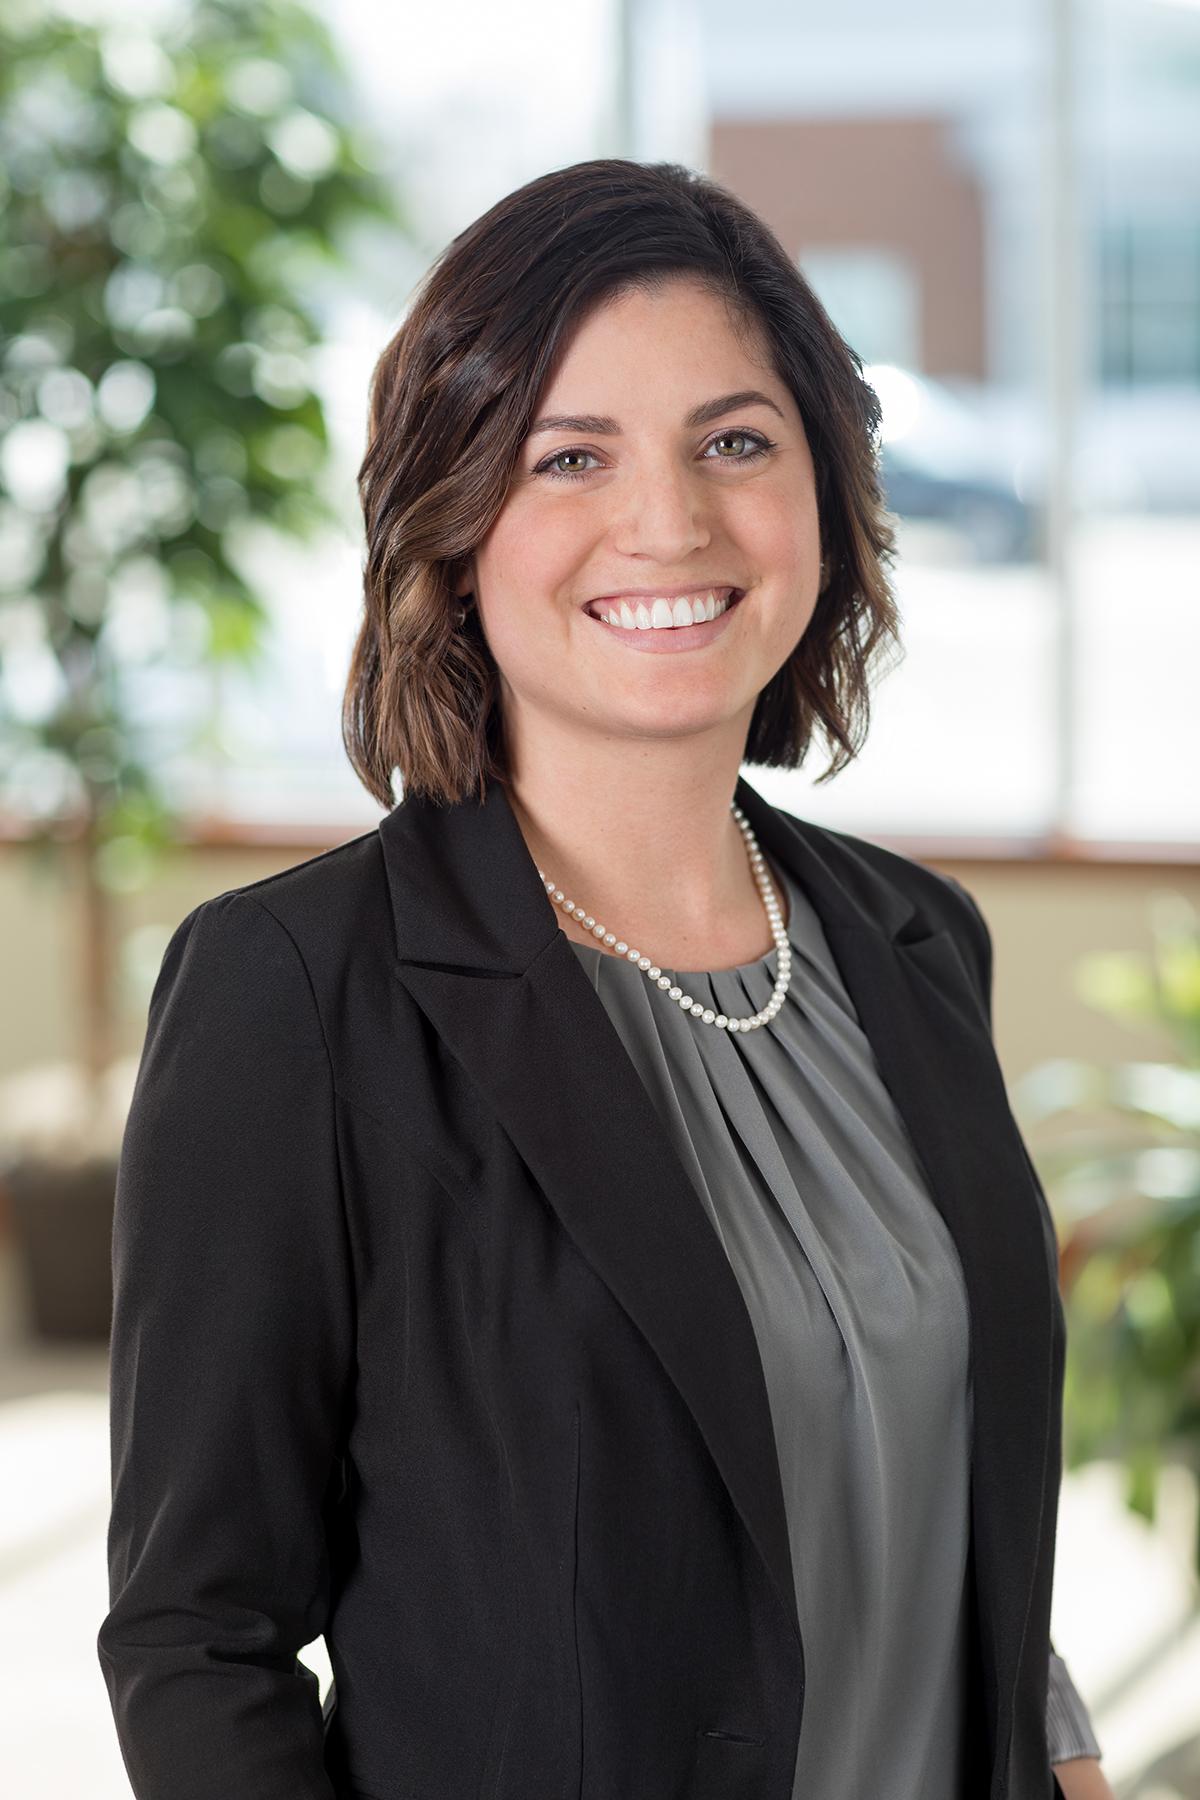 Kristina Therrien